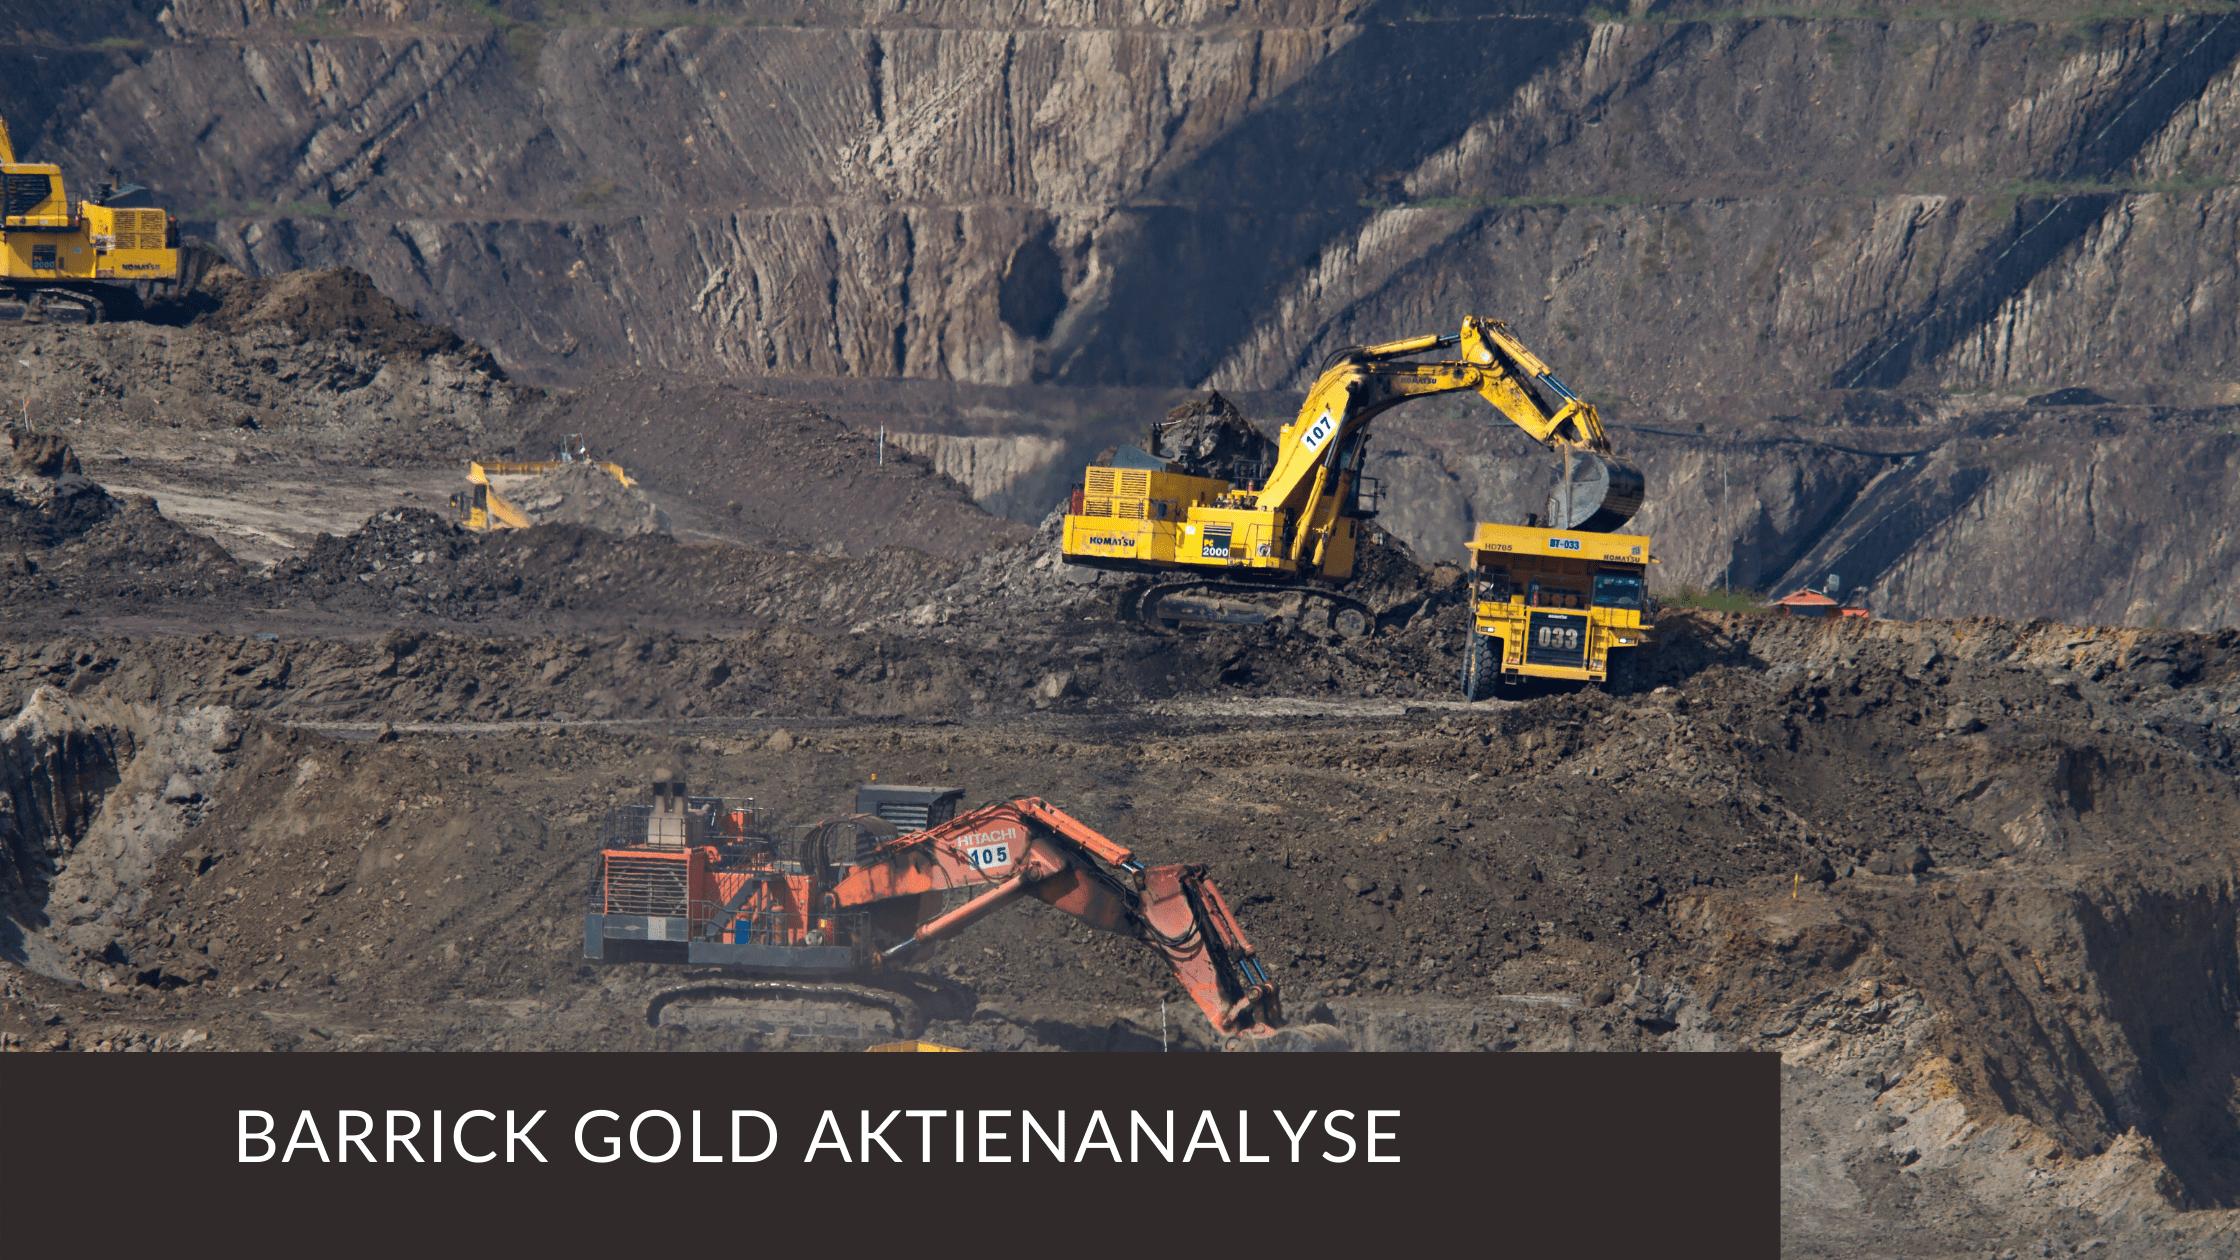 Barrick Gold Aktienanalyse